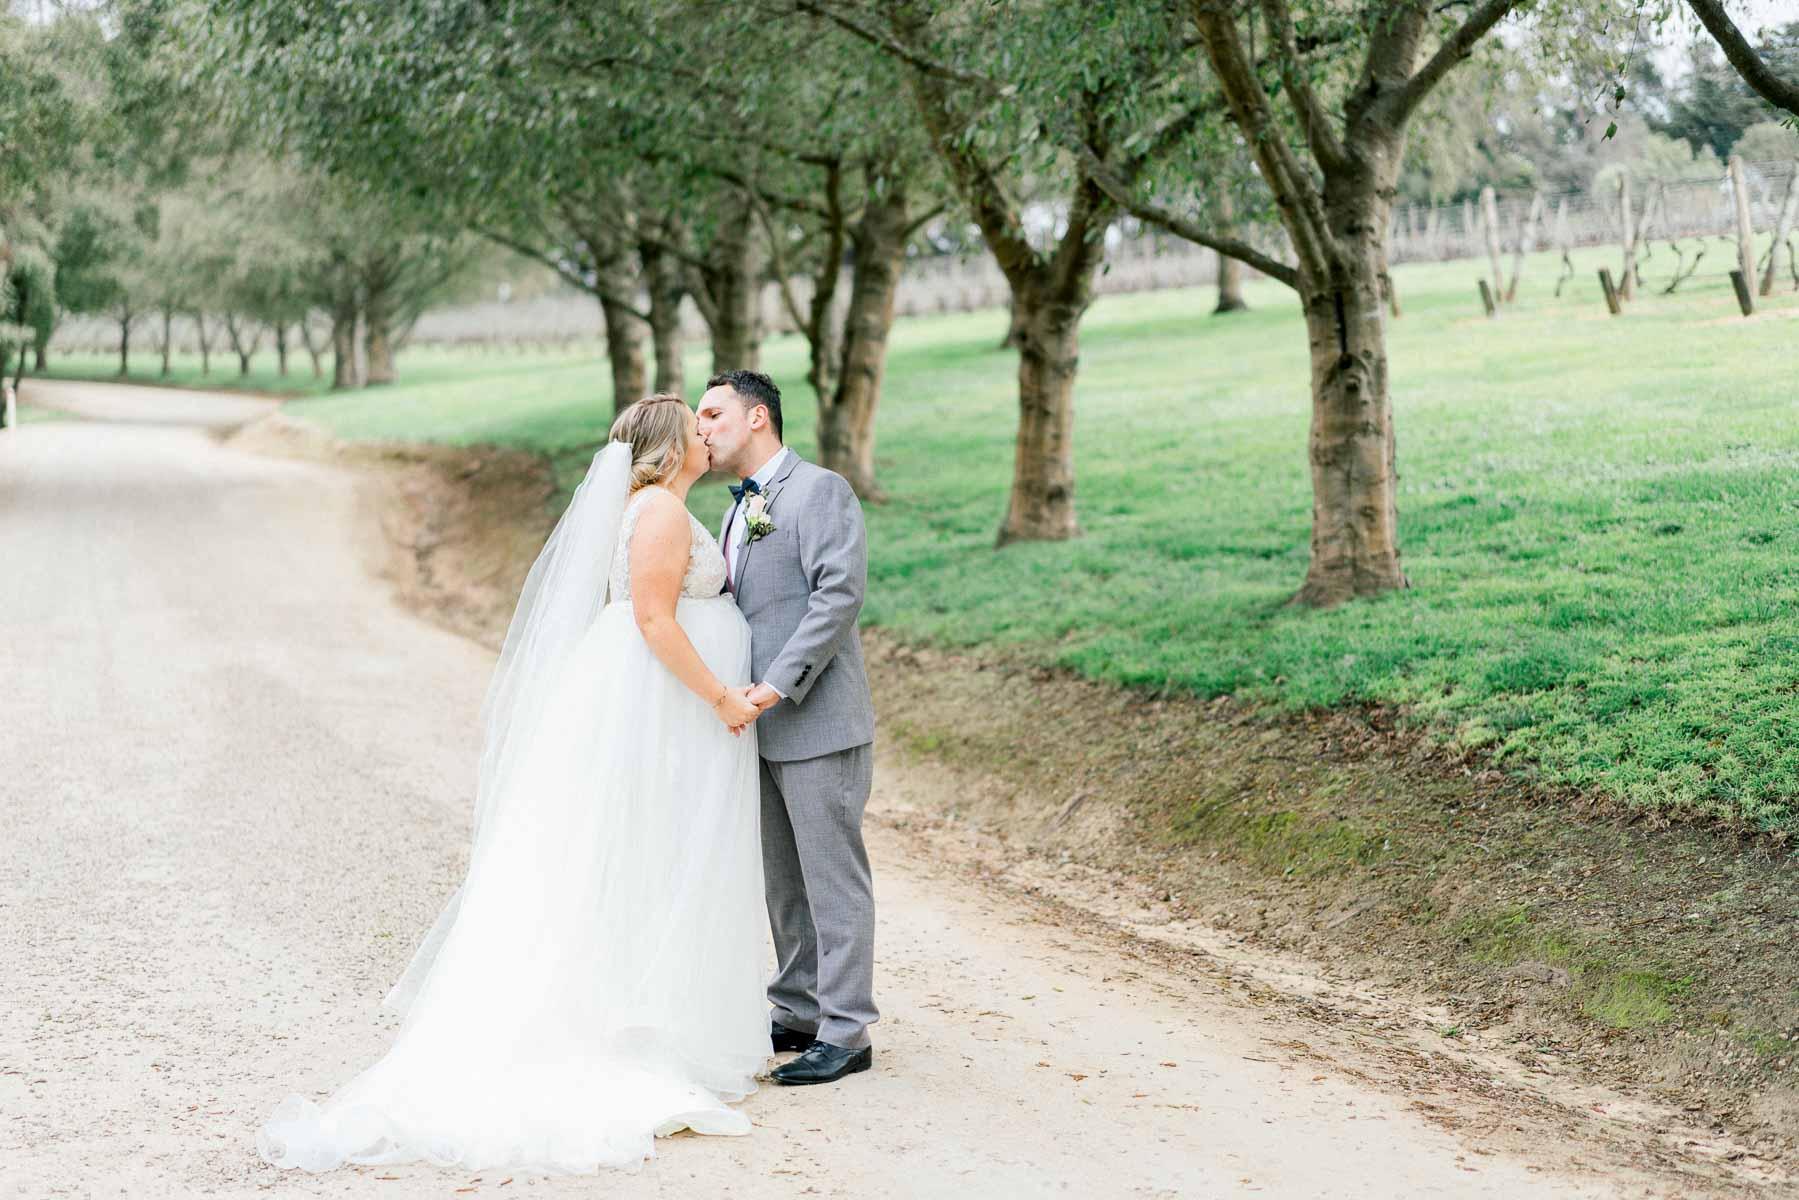 lindenderry-wedding-heart+soul-weddings-amy-alain-03703.jpg